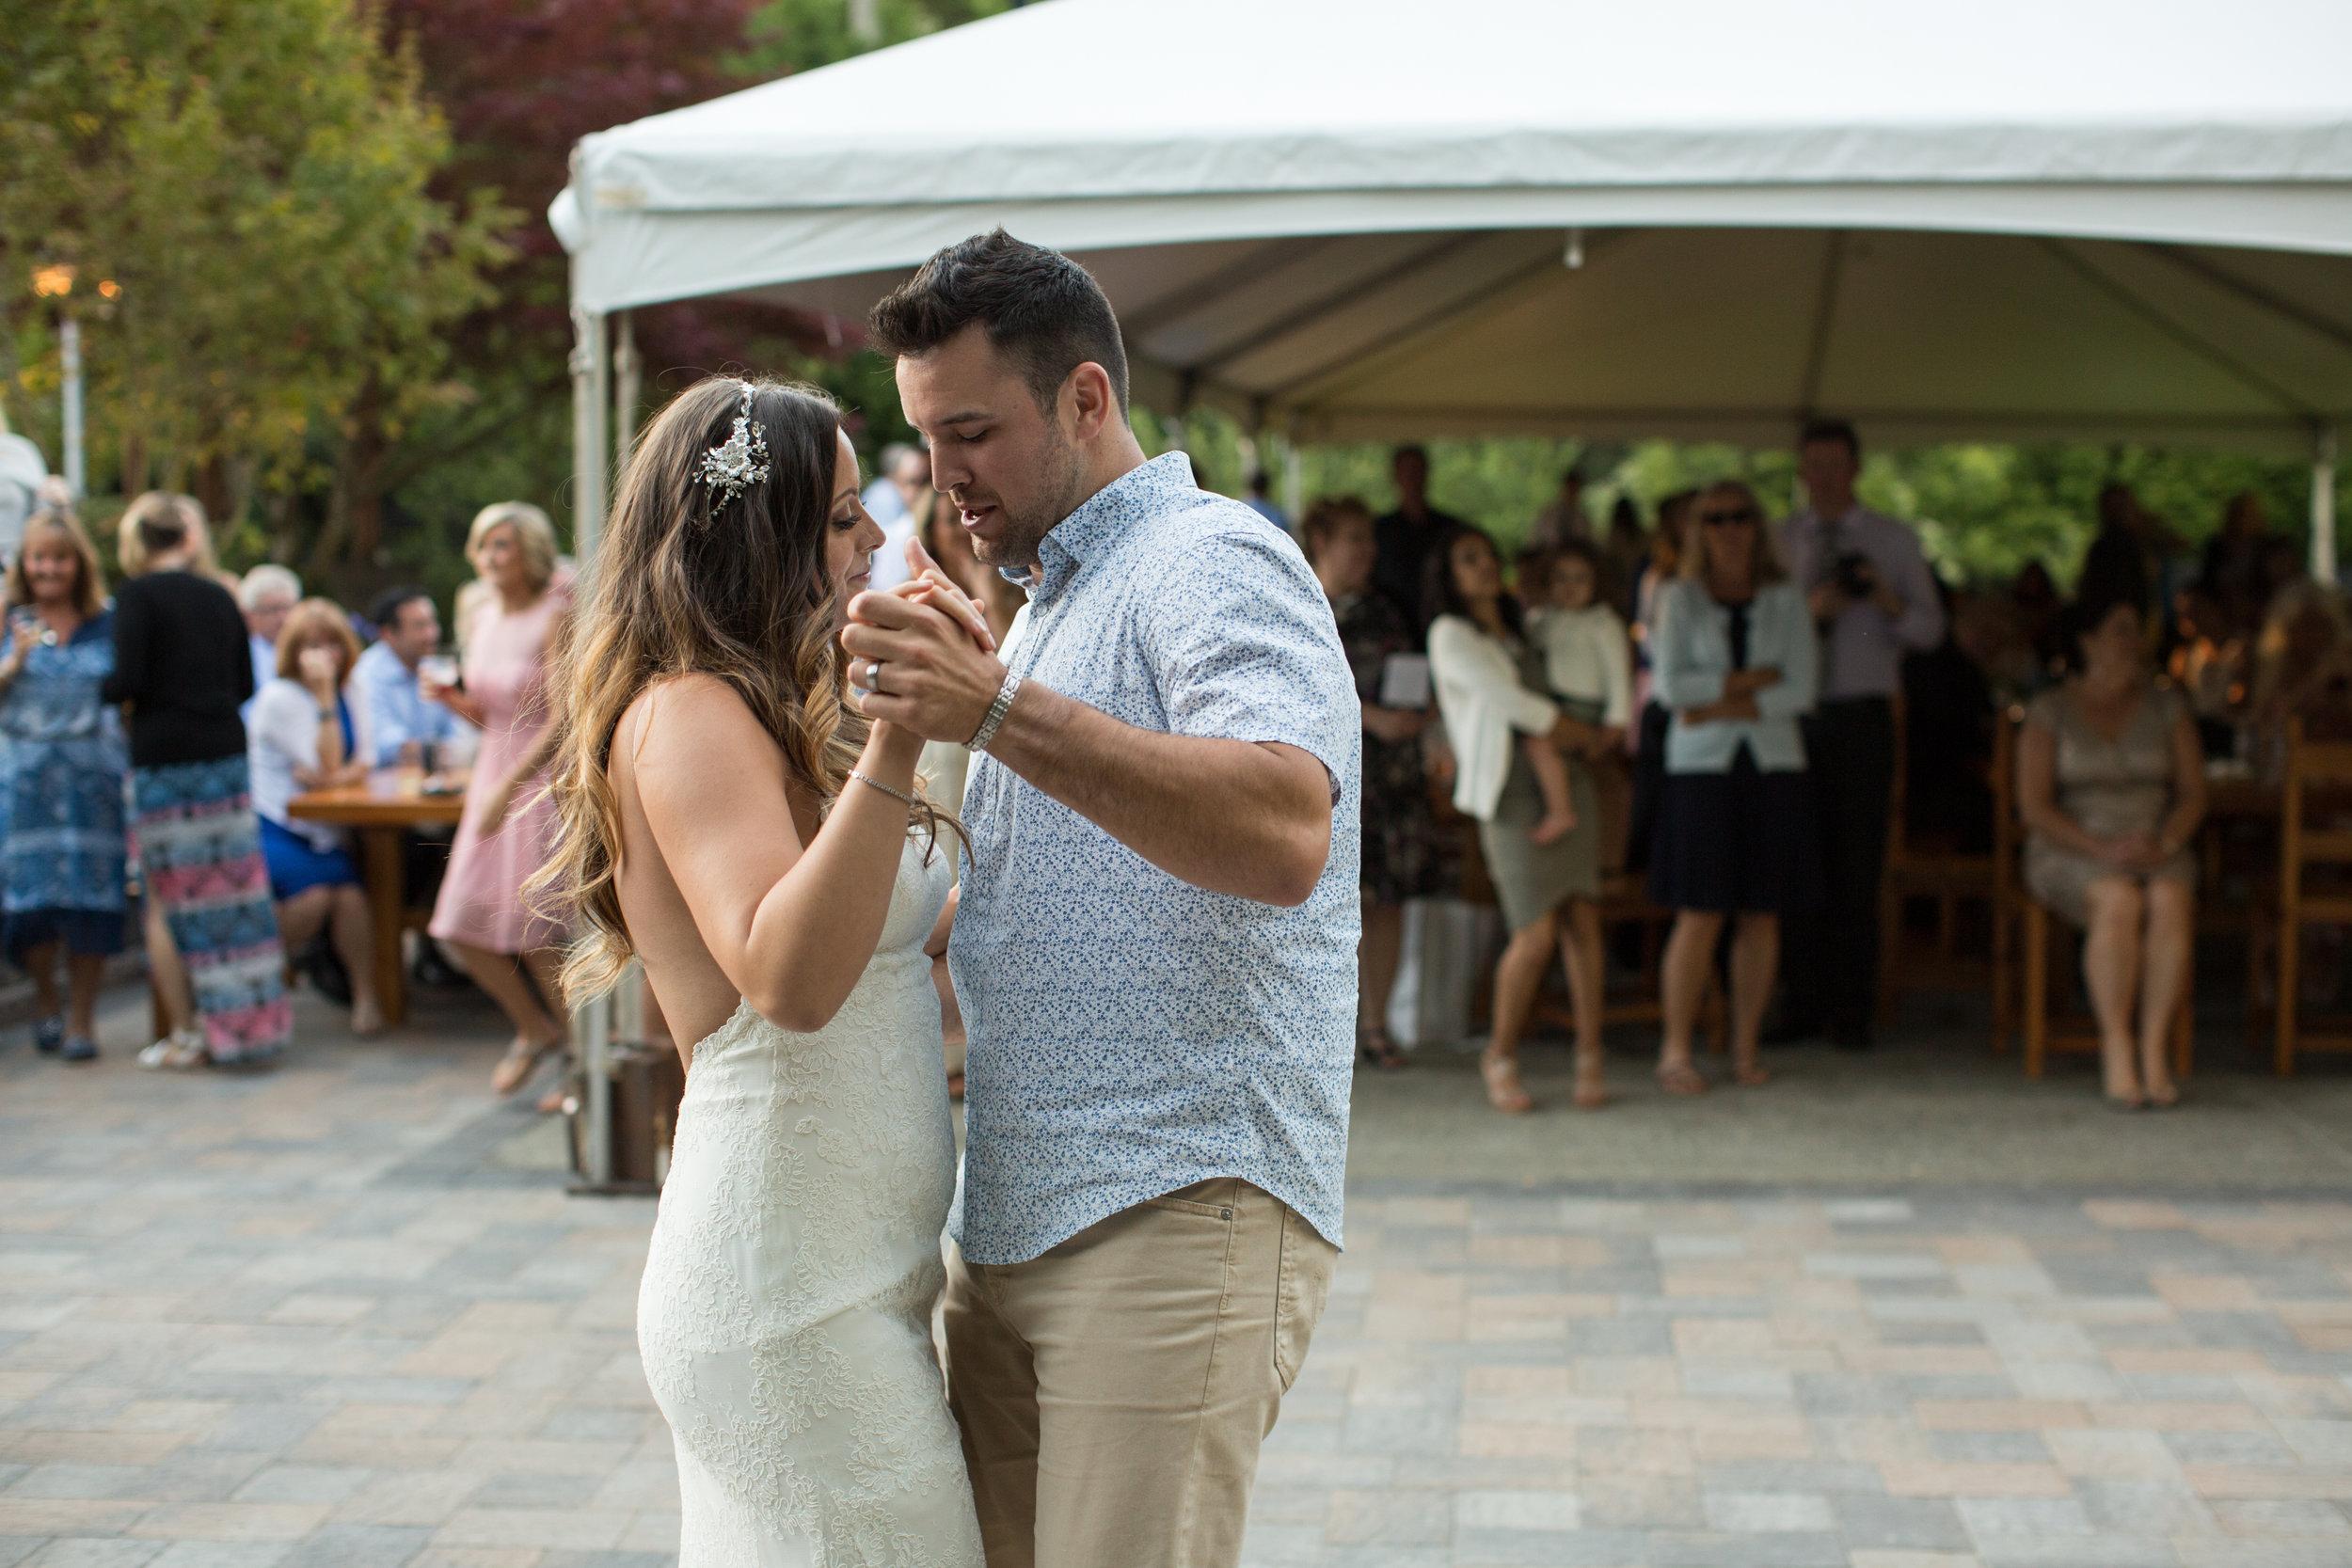 sandstrom_wedding_717.jpg